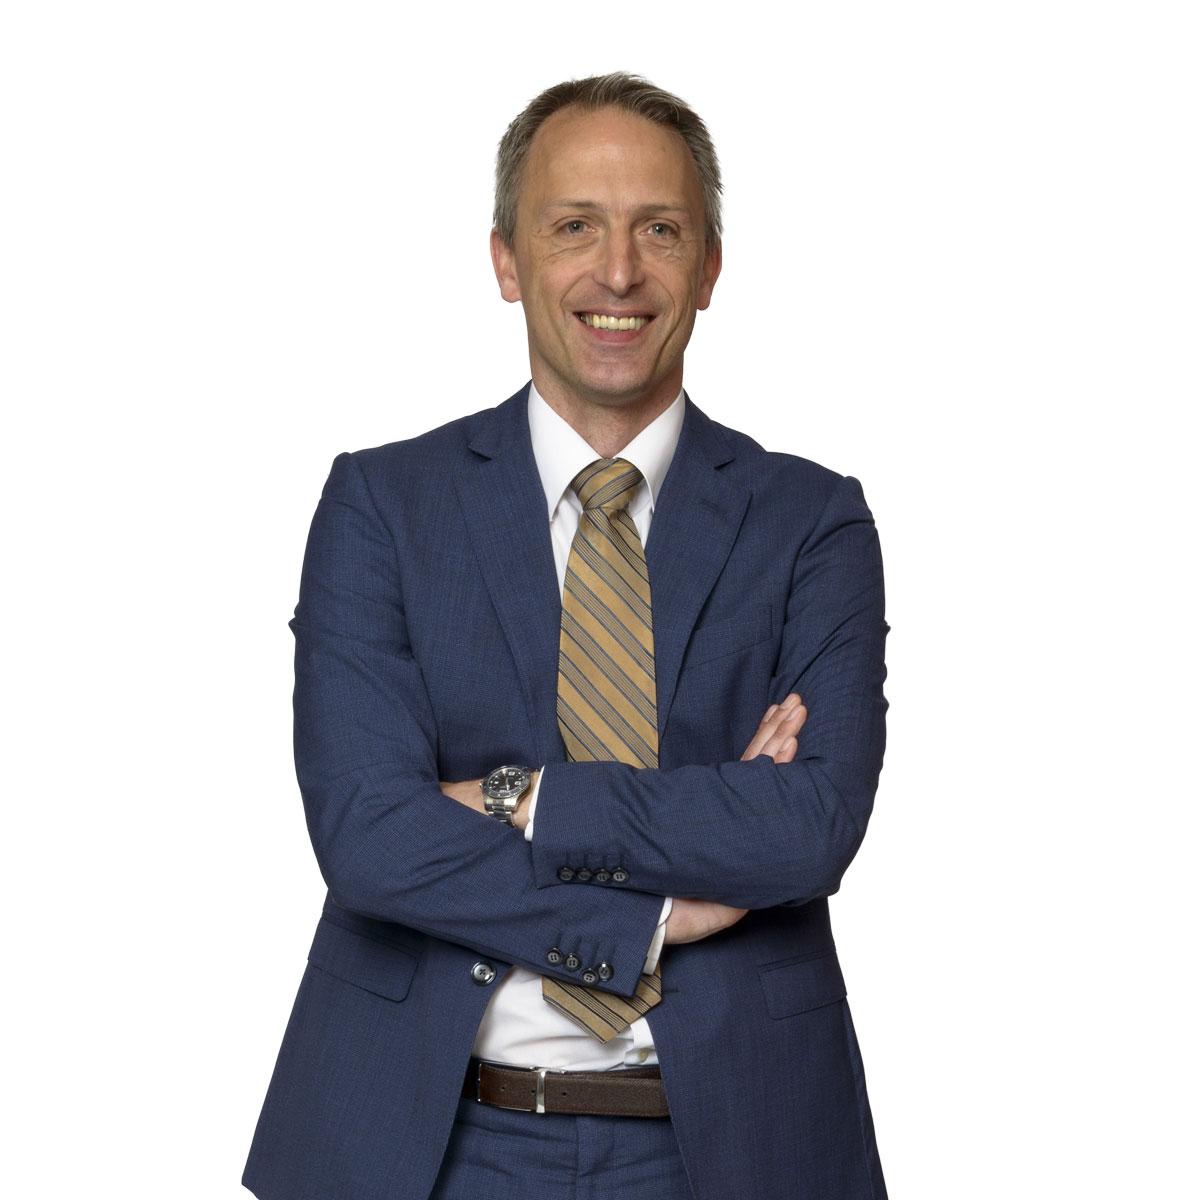 Sébastien Van Eyll